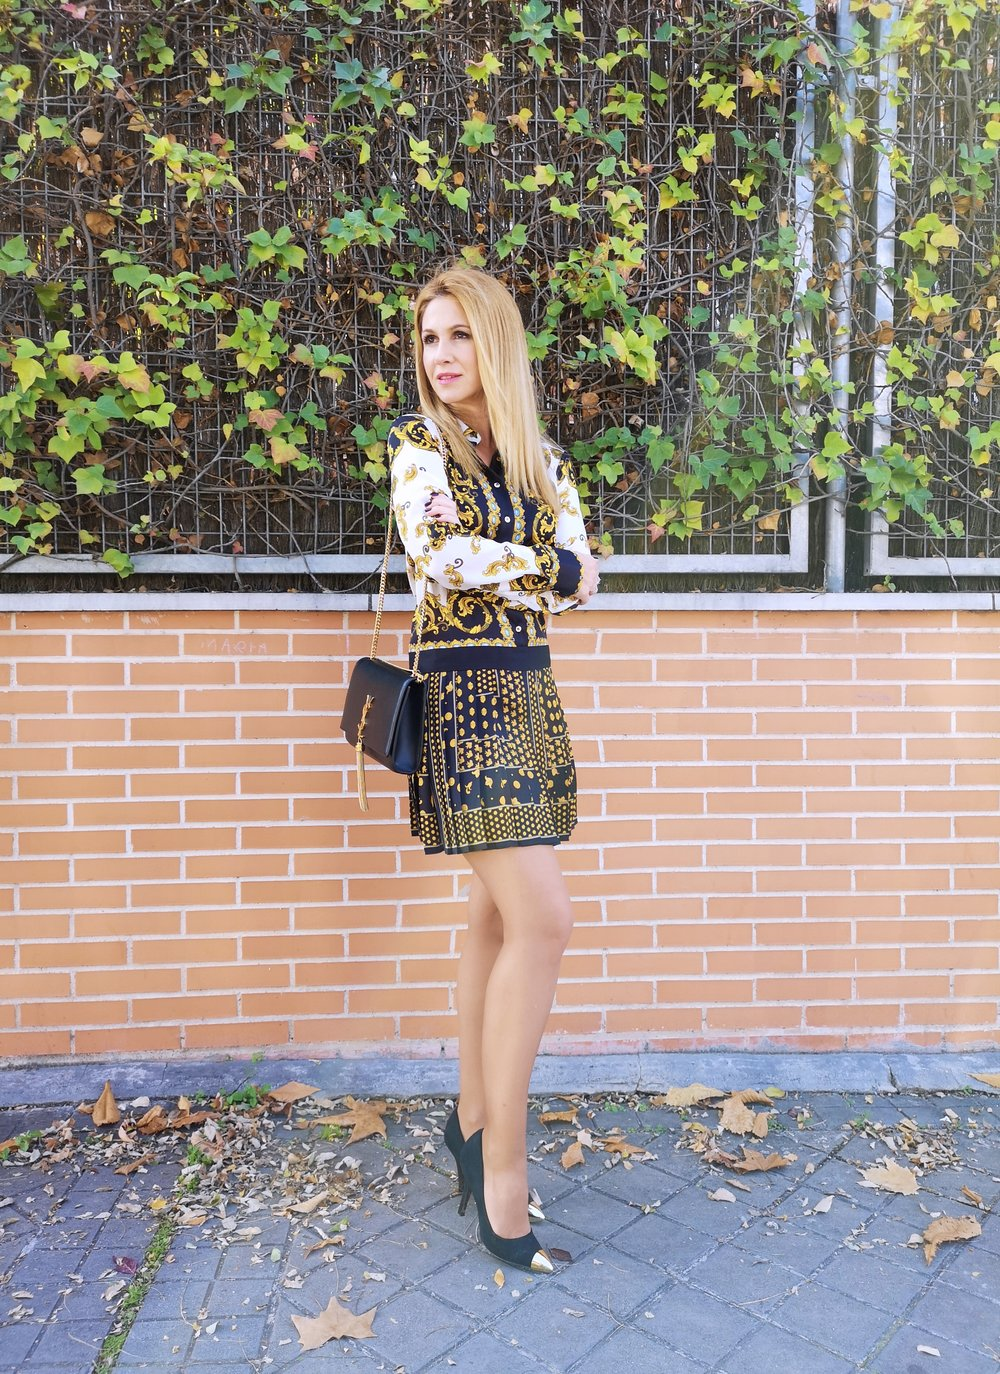 versace-style-dress